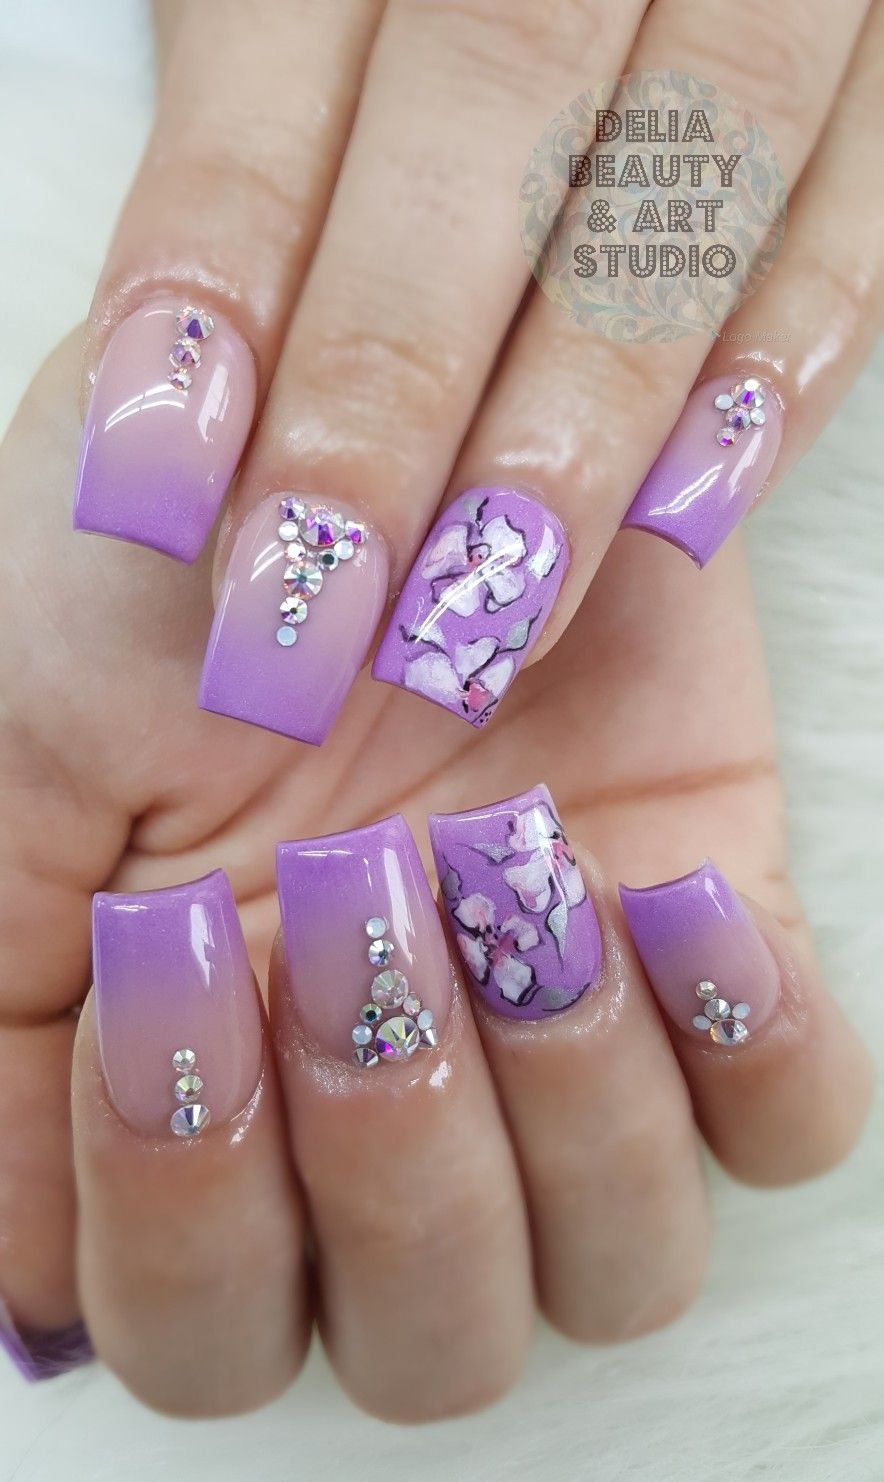 Acrylics Ombre Nails Purple Nails Free Handed Flower Nail Art All Powder Purple Nails Flower Nail Art Nail Art